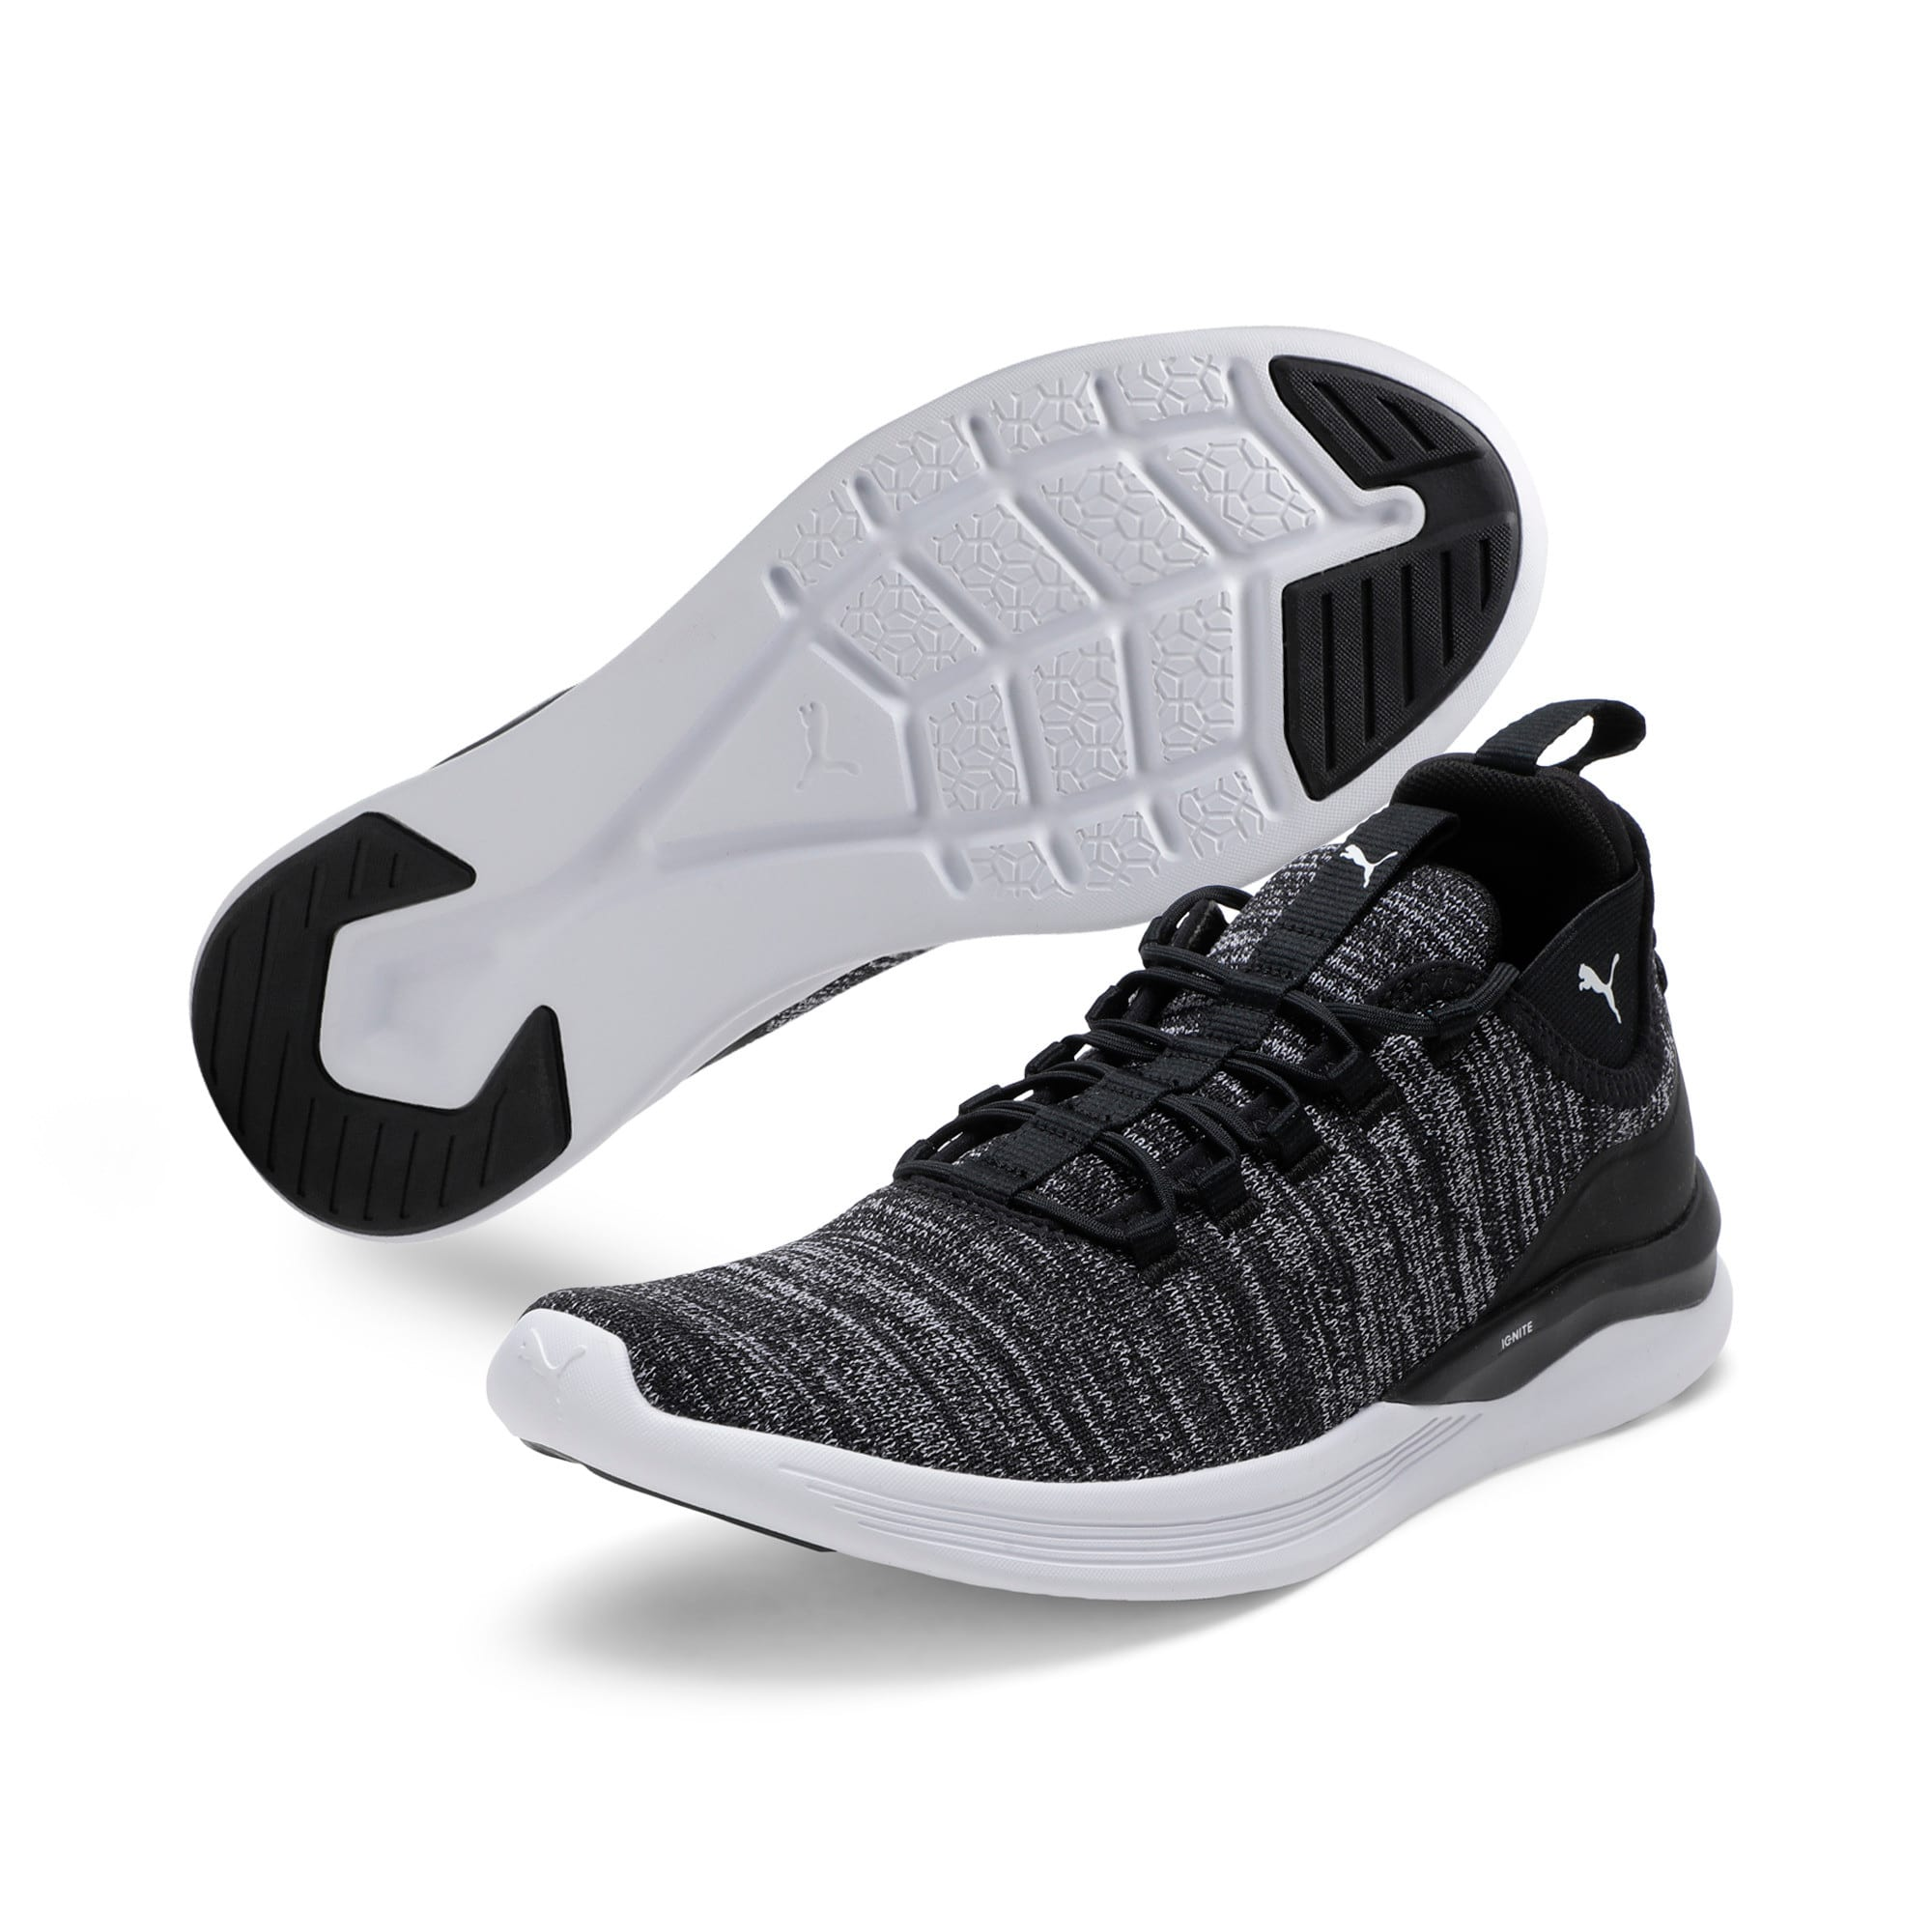 Thumbnail 2 of Flash Daunt Men's Running Shoes, Puma Black-Asphalt- White, medium-IND